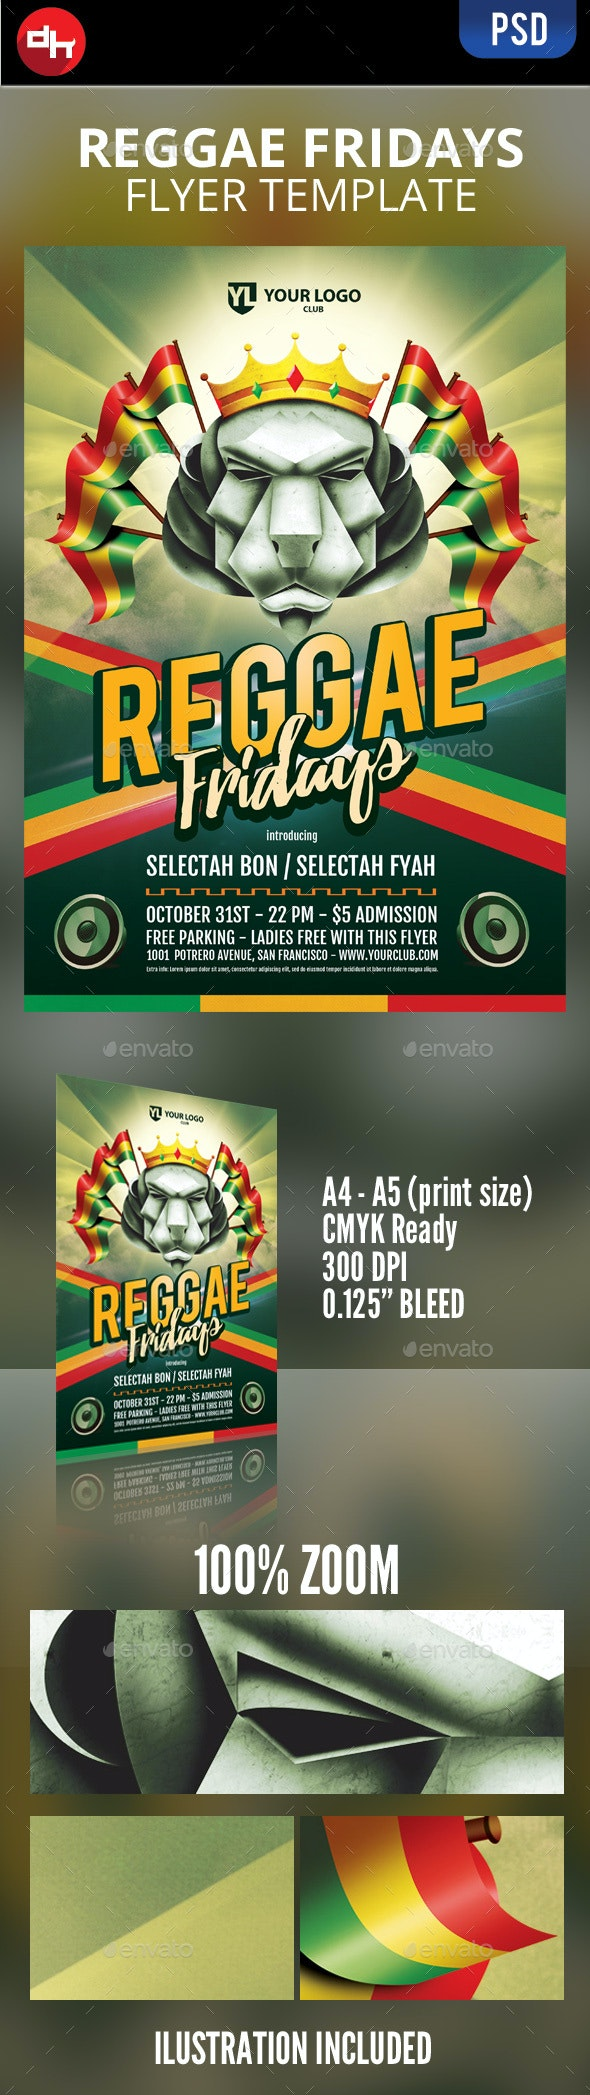 Reggae Fridays - Events Flyers